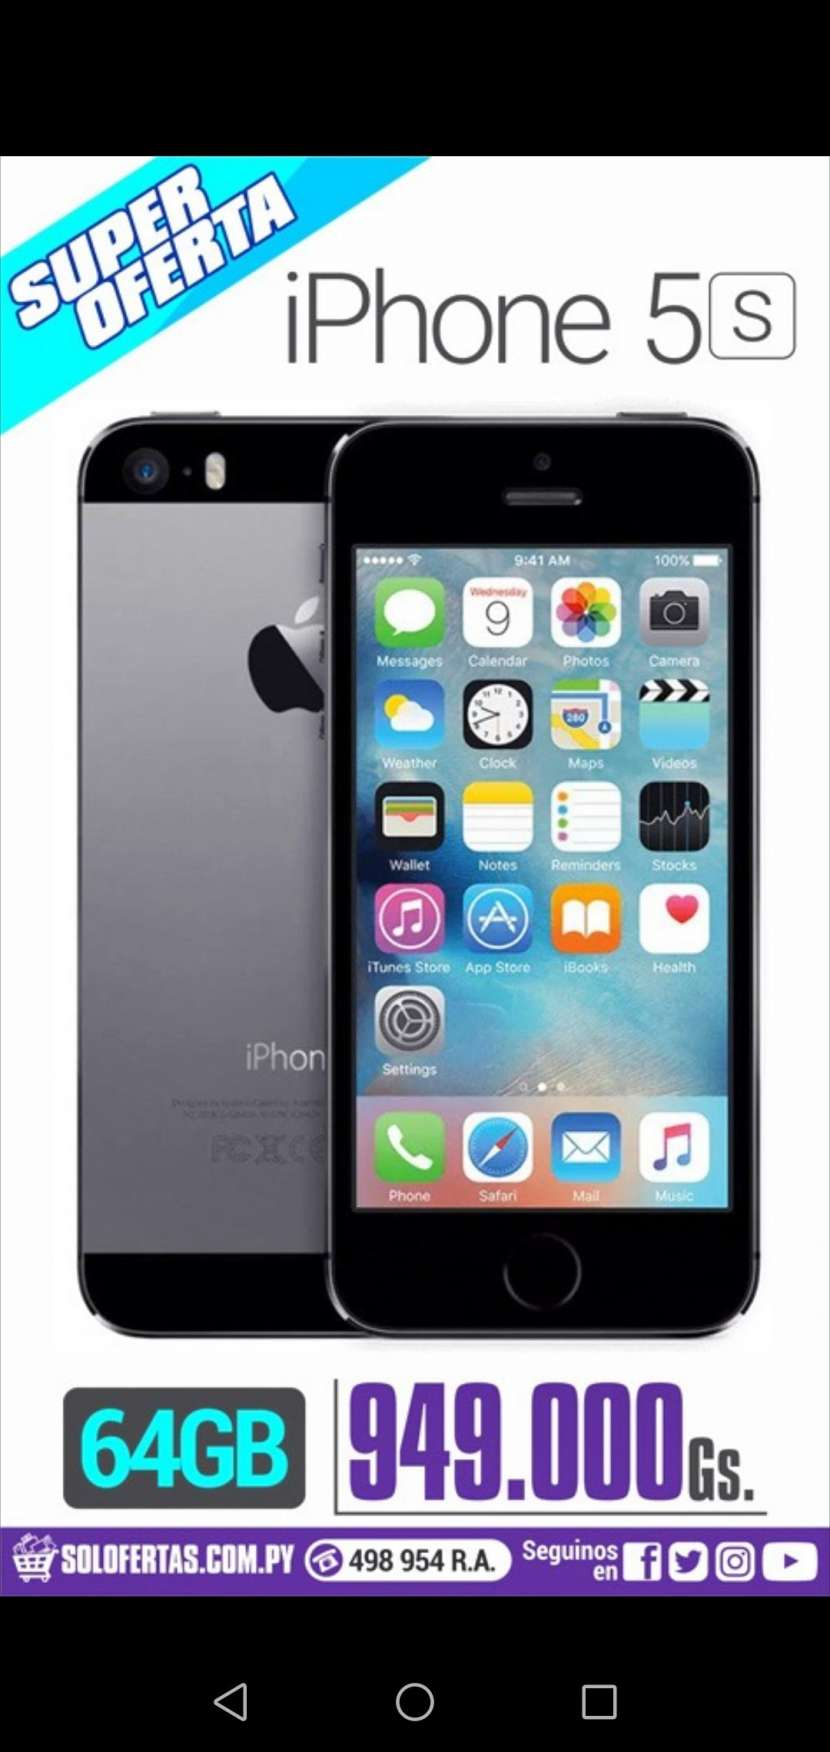 iPhone 5s de 64 gb - 0